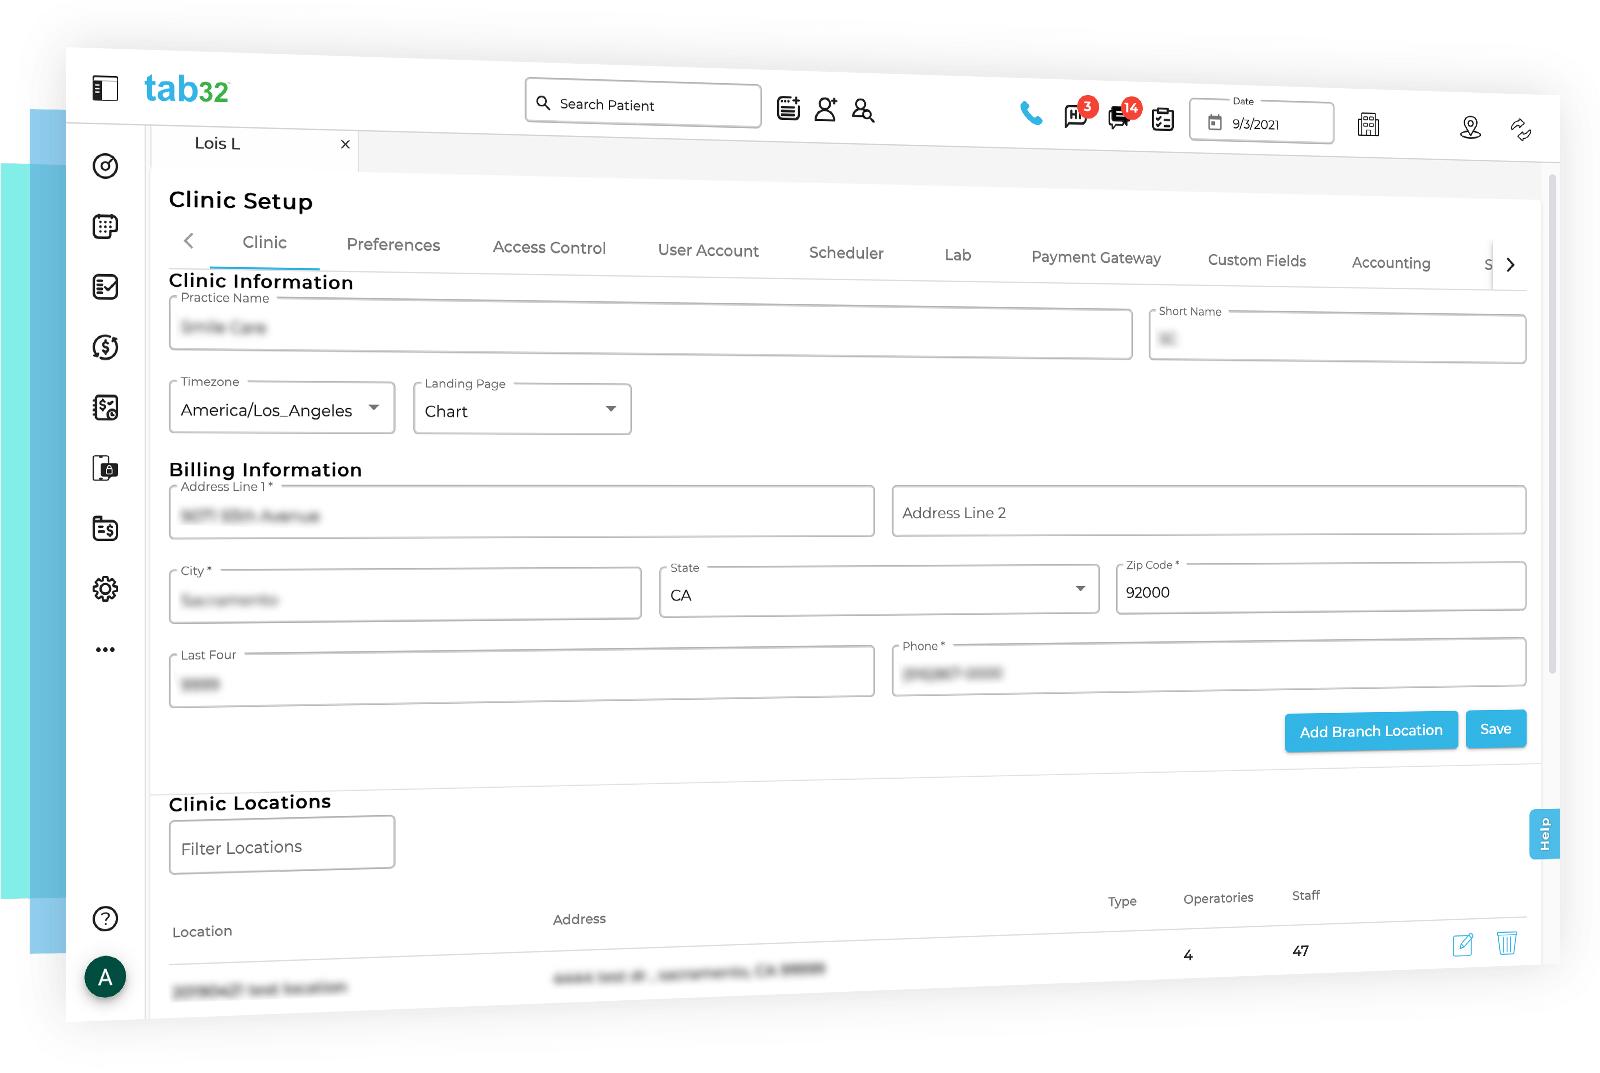 PlatformAr-Productimage-new